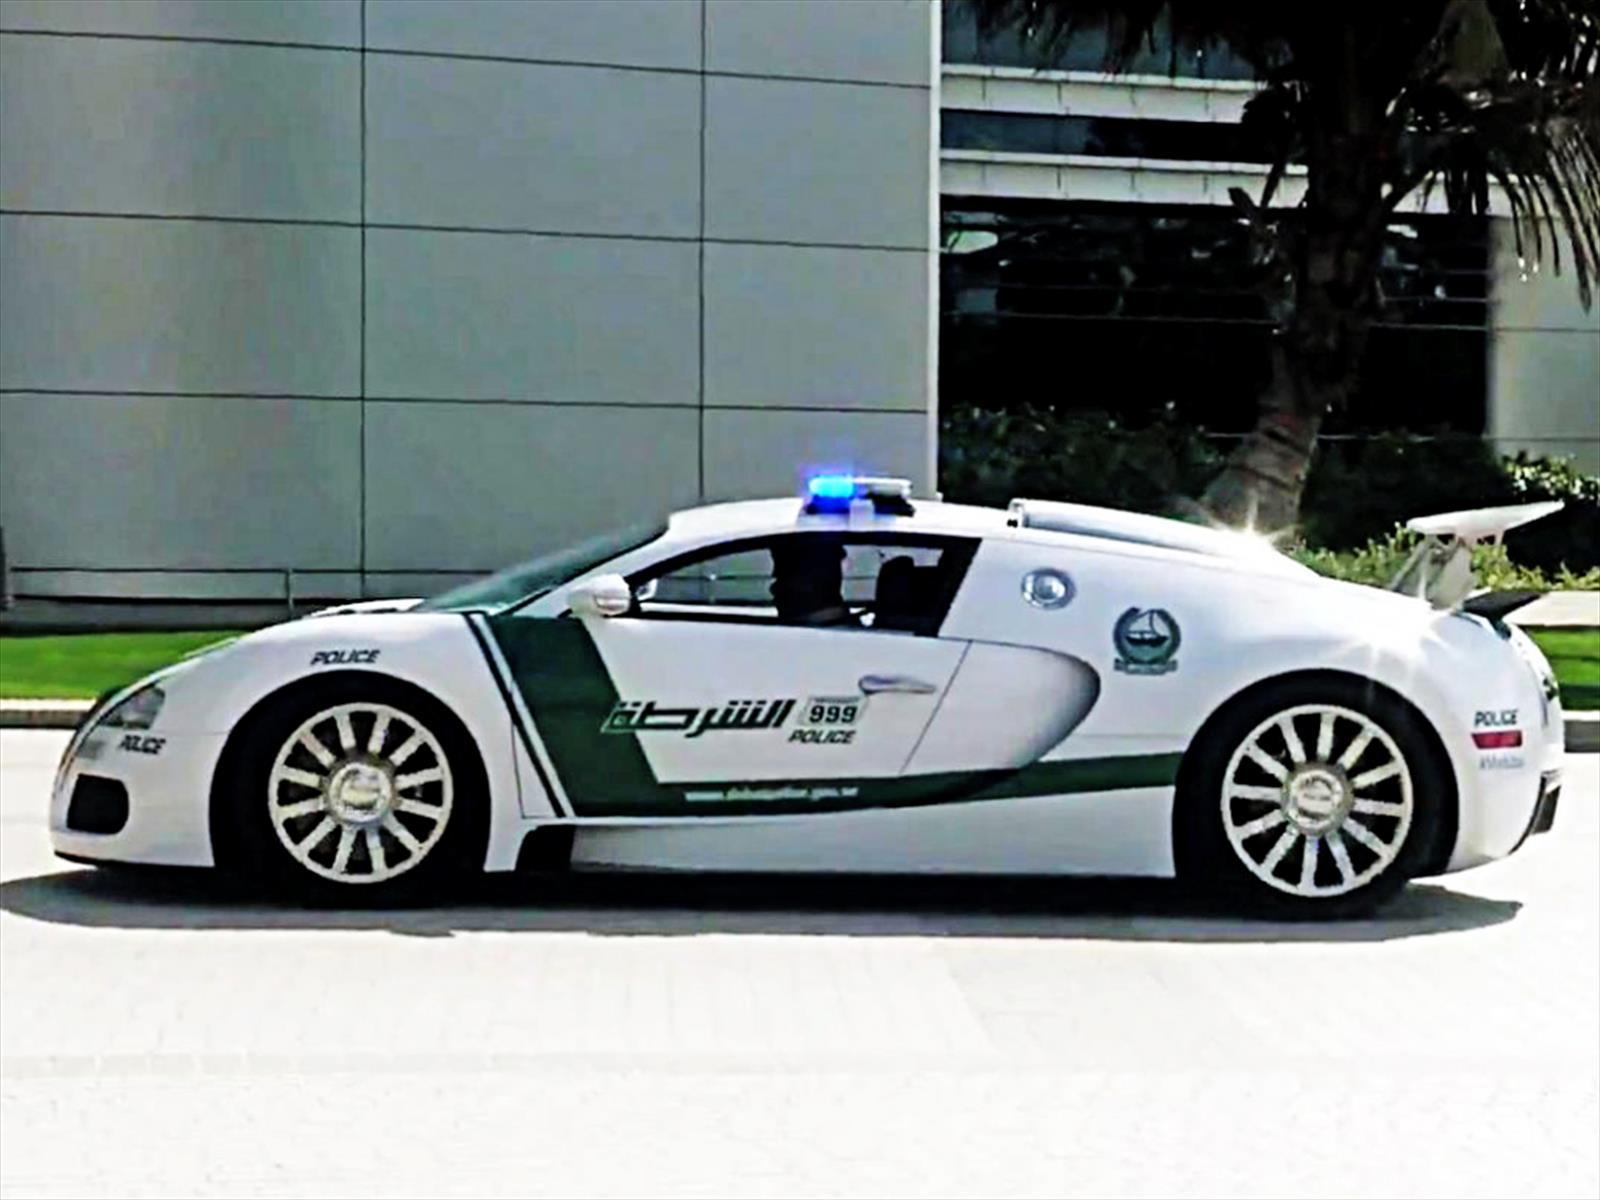 Cl Mustang >> Bugatti Veyron: Se suma a la súper flota de patrullas de Dubai - Autocosmos.com